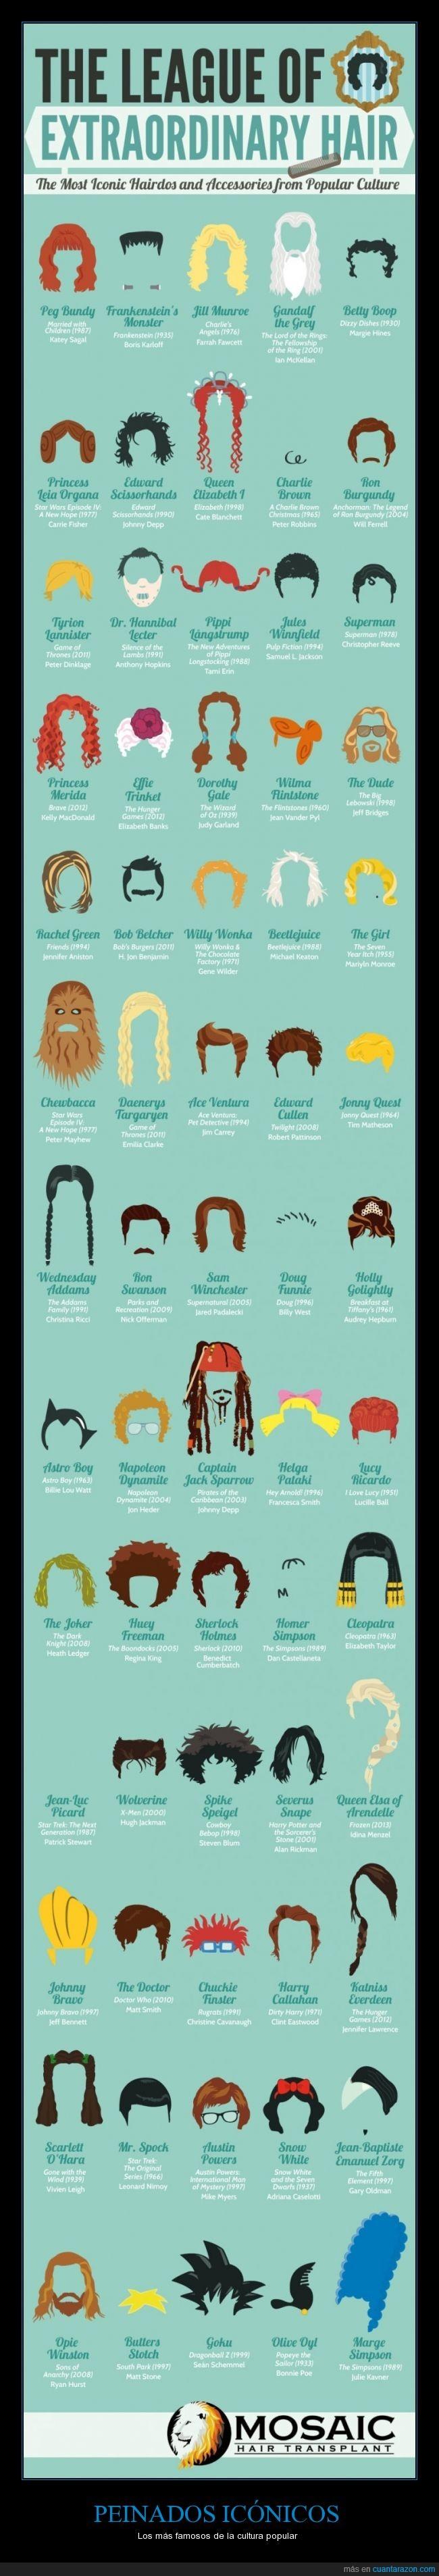 cabello,cultura general,famosos,peinado,pelo